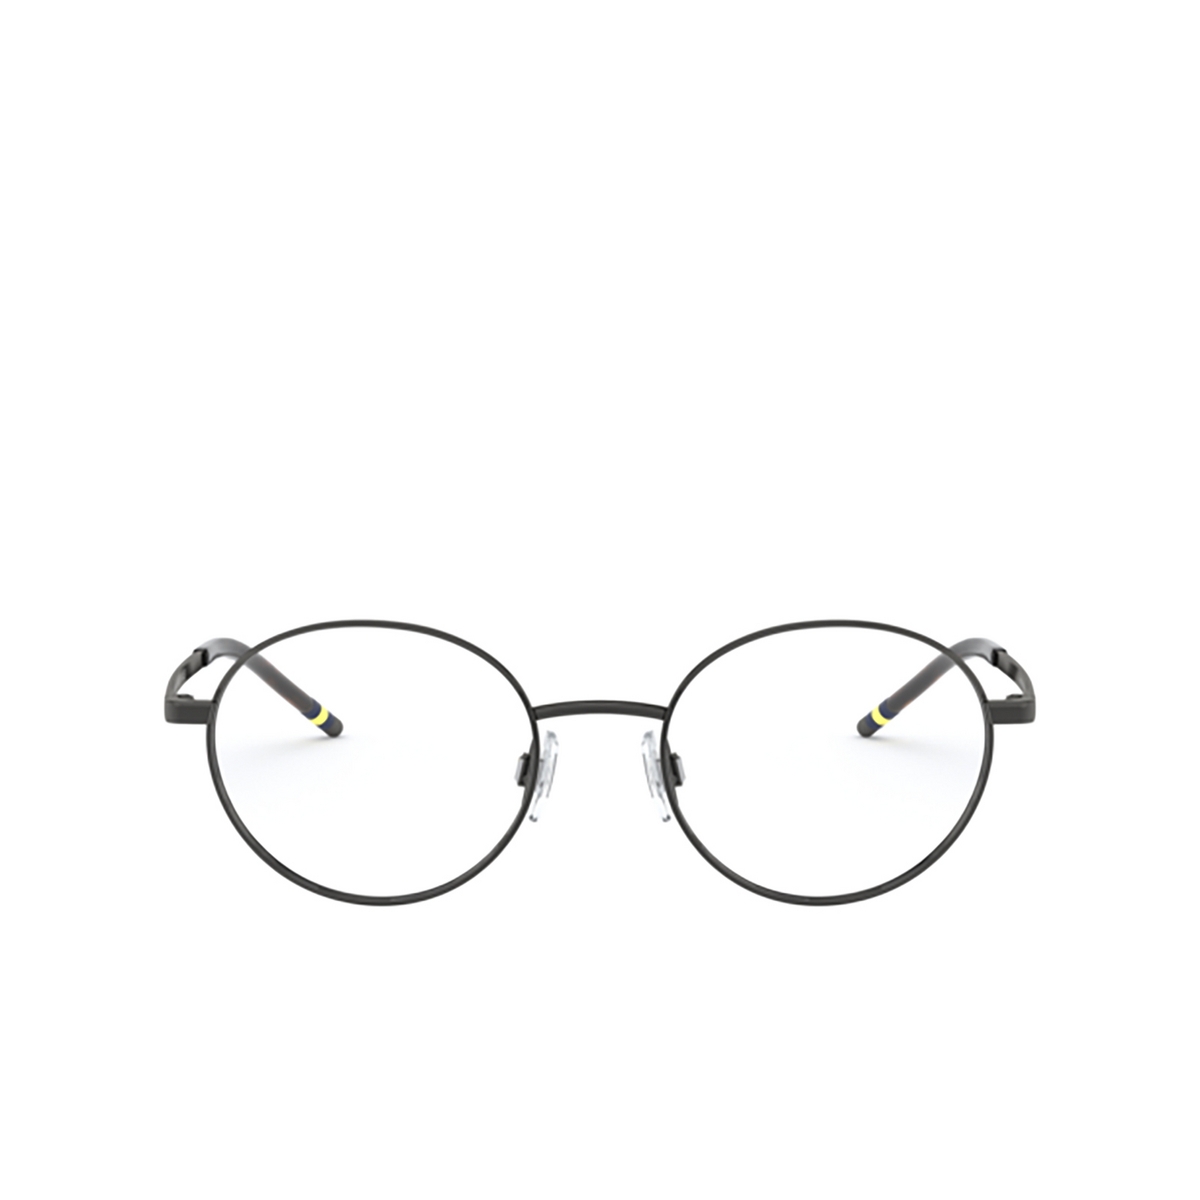 Polo Ralph Lauren® Oval Eyeglasses: PH1193 color Shiny Dark Gunmetal 9157.